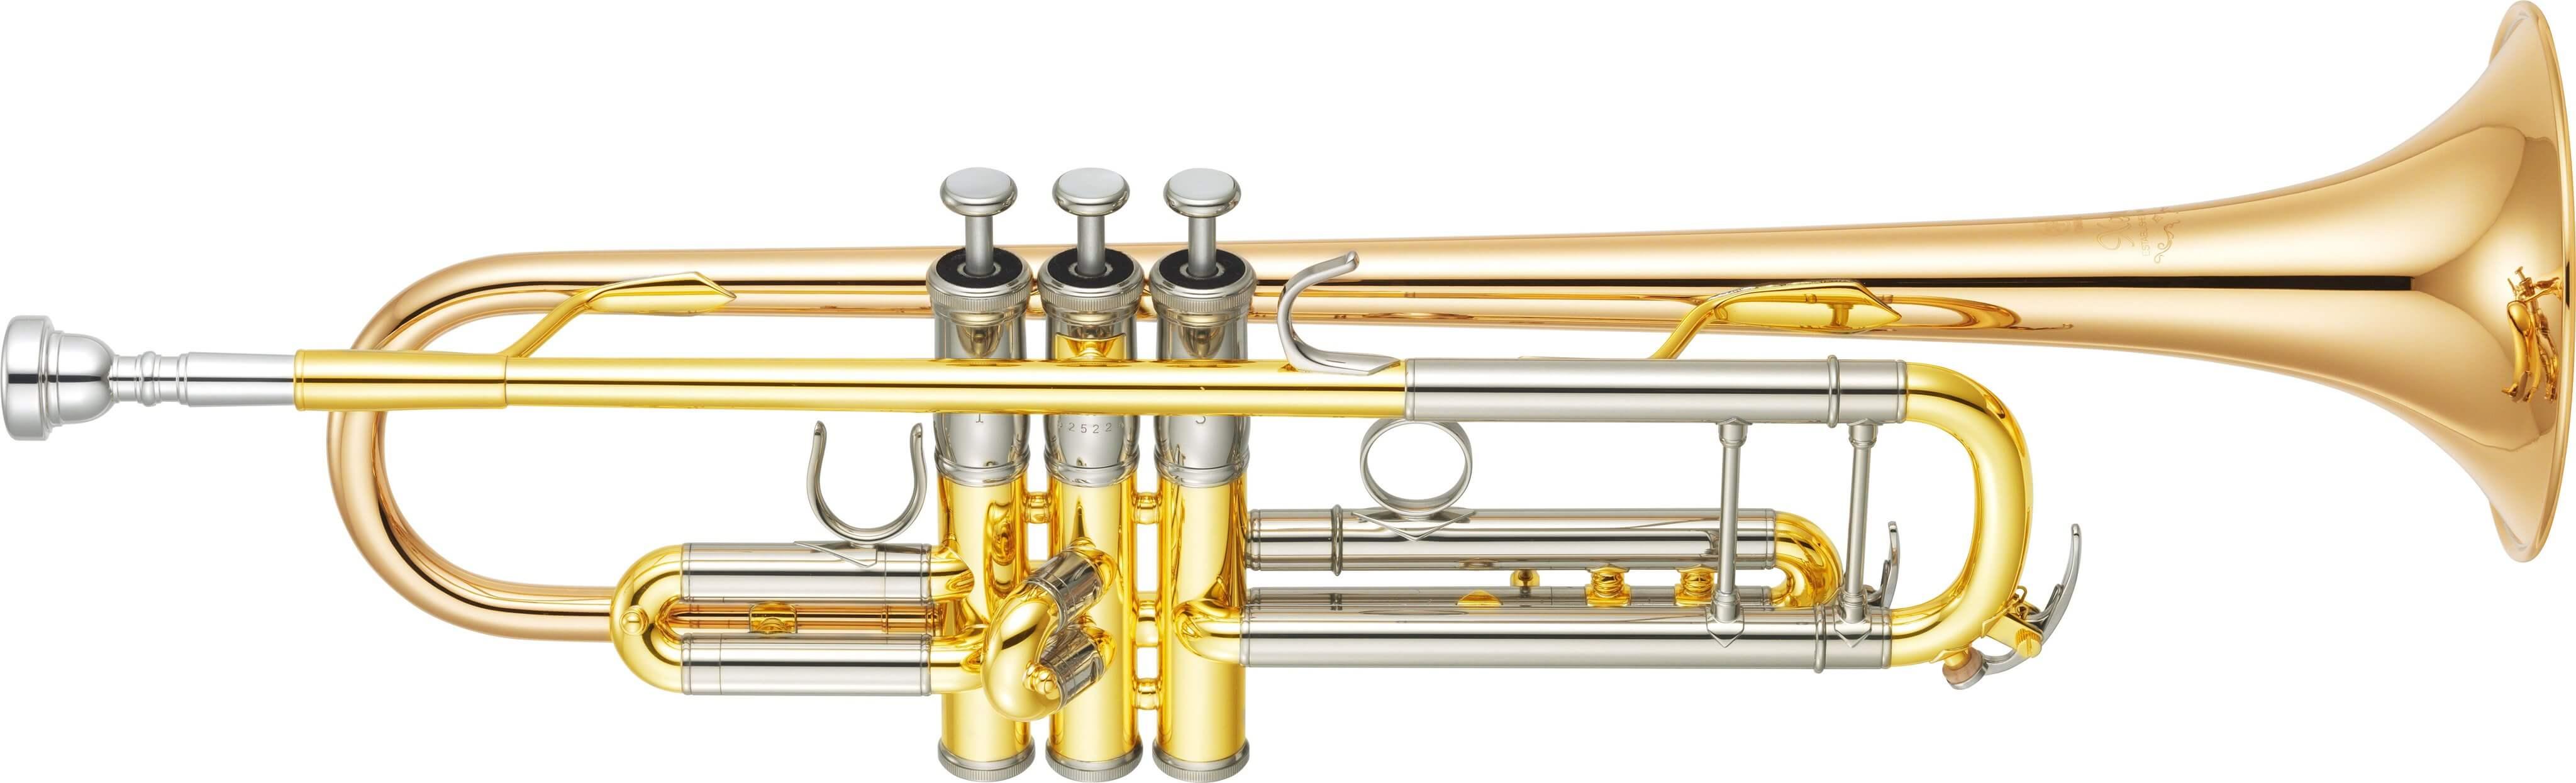 Trompeta Yamaha Ytr 8335G Plateada